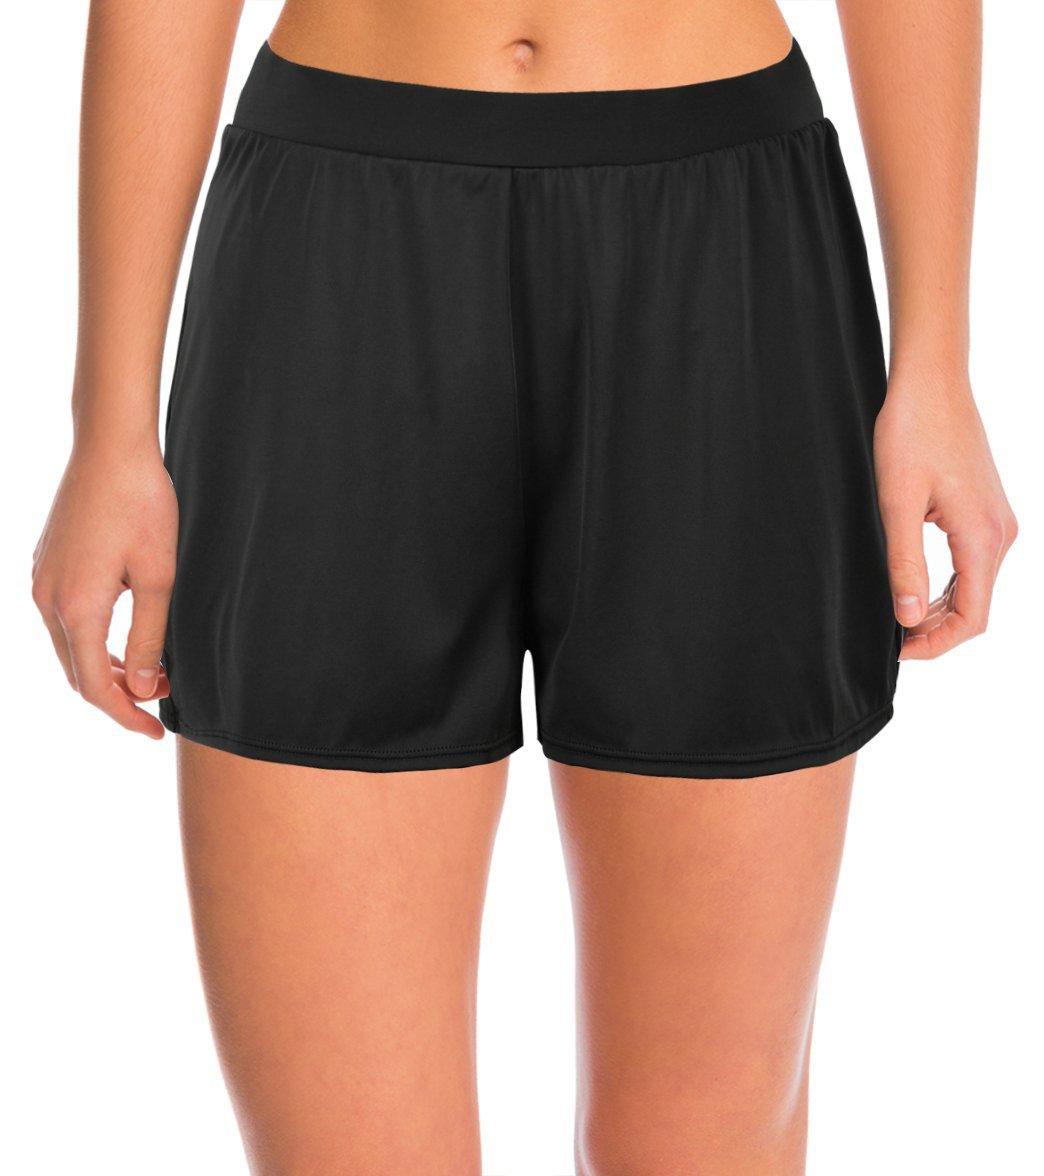 Septangle Women's Solid Color Waistband Tankini Boyleg Swimsuit Bottom Boardshorts with Briefs … (US 18, Black)